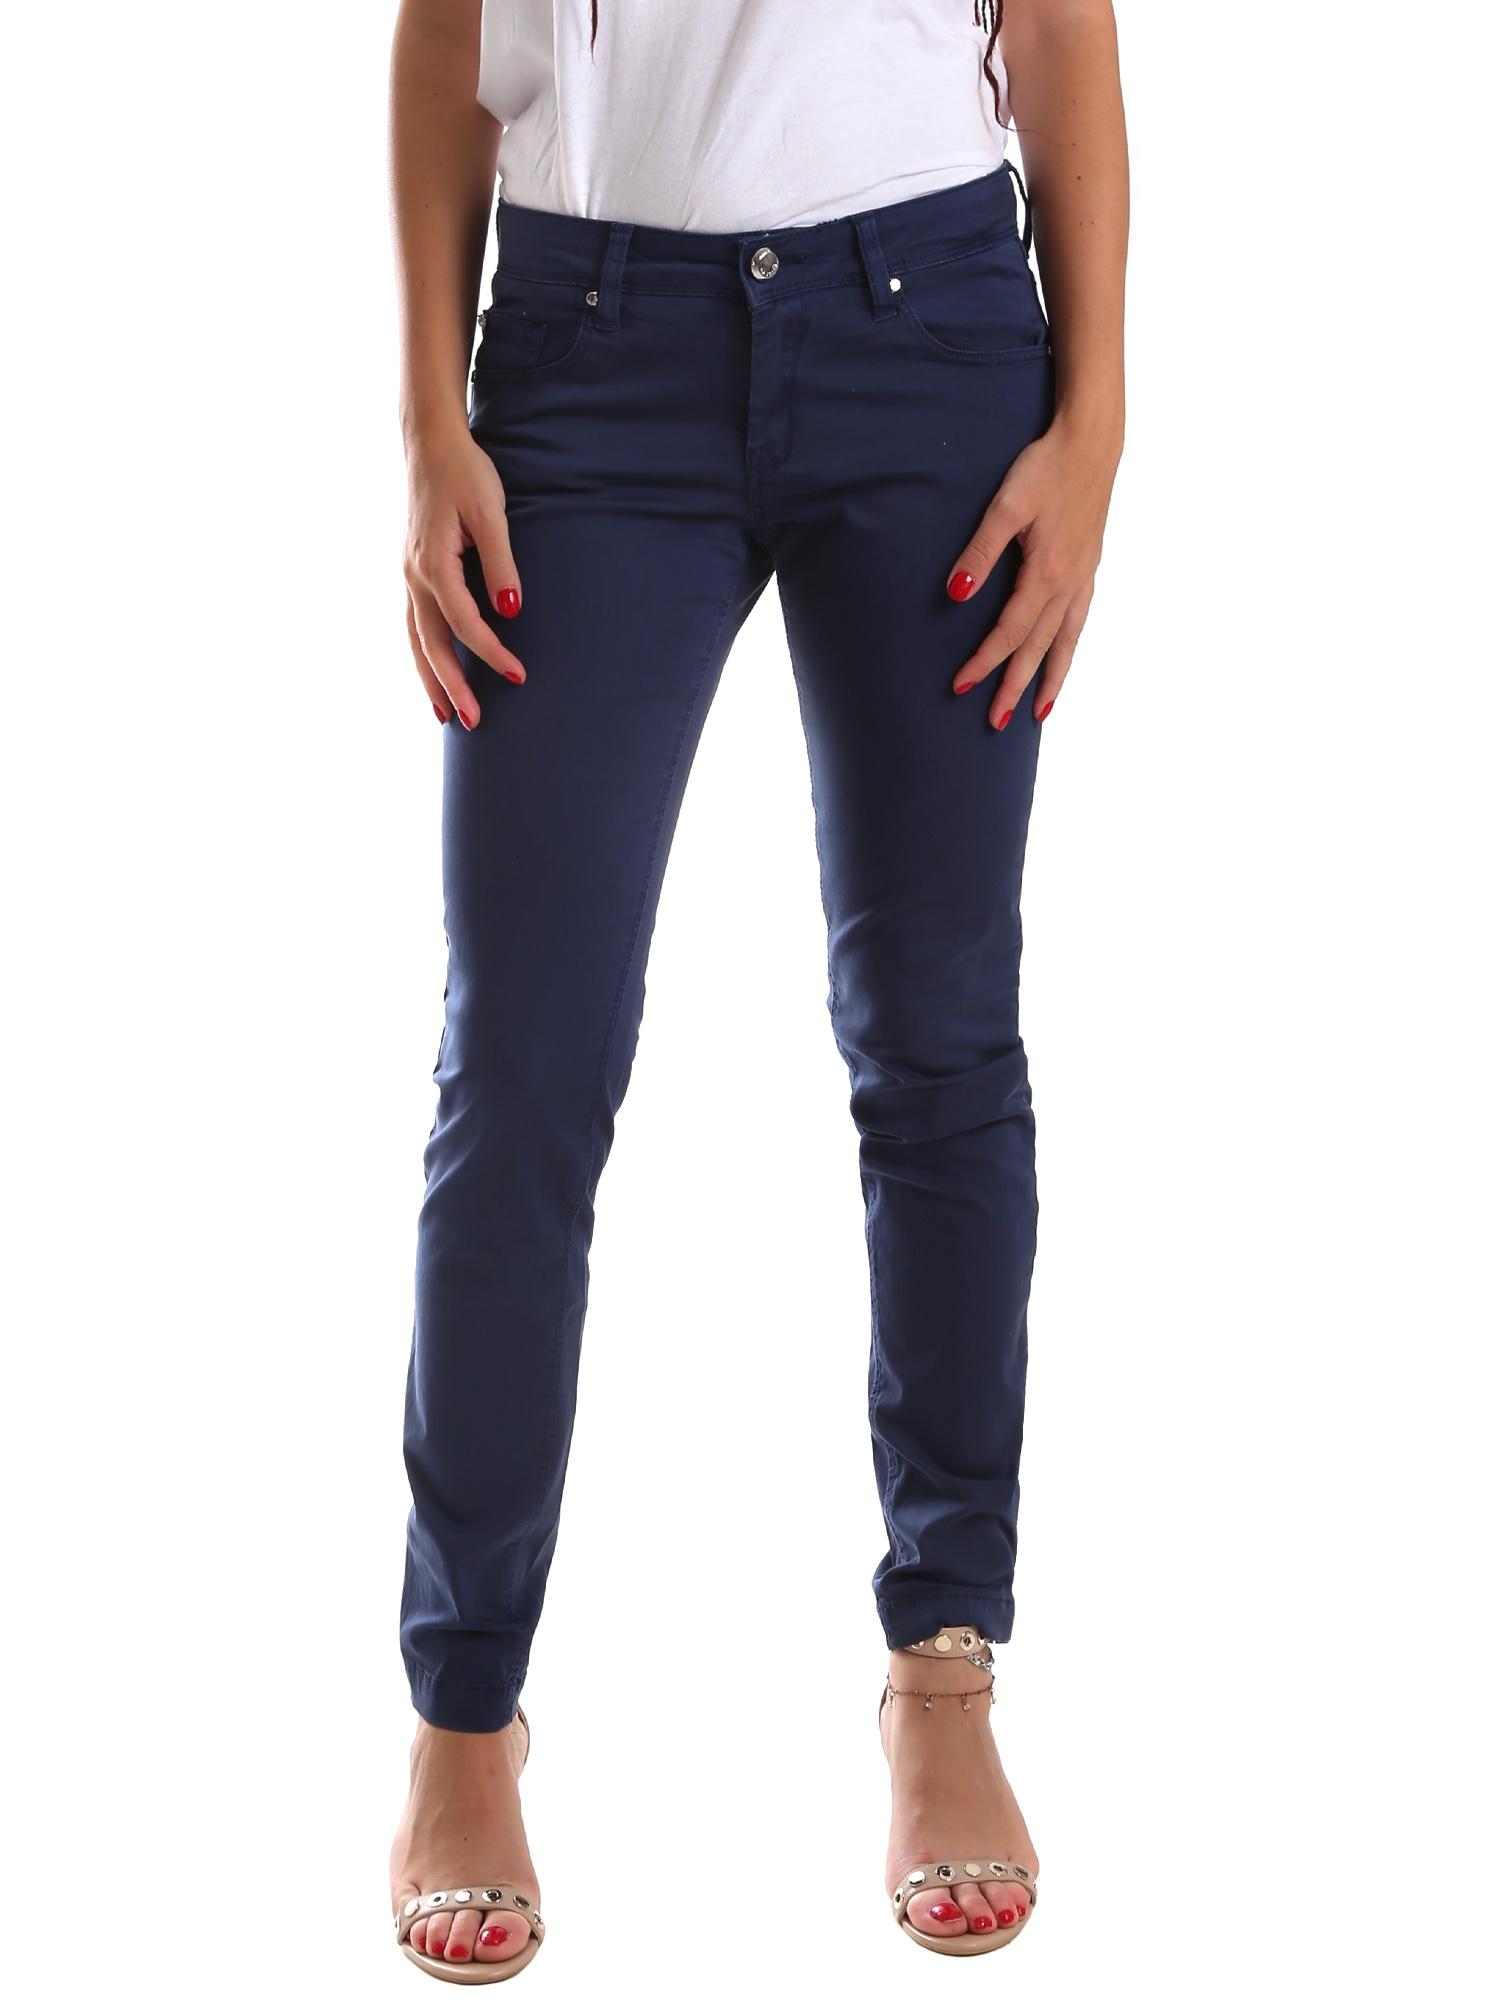 Pantalone 5 tasche in cotone  GAUDI | Pantaloni | BD250052843